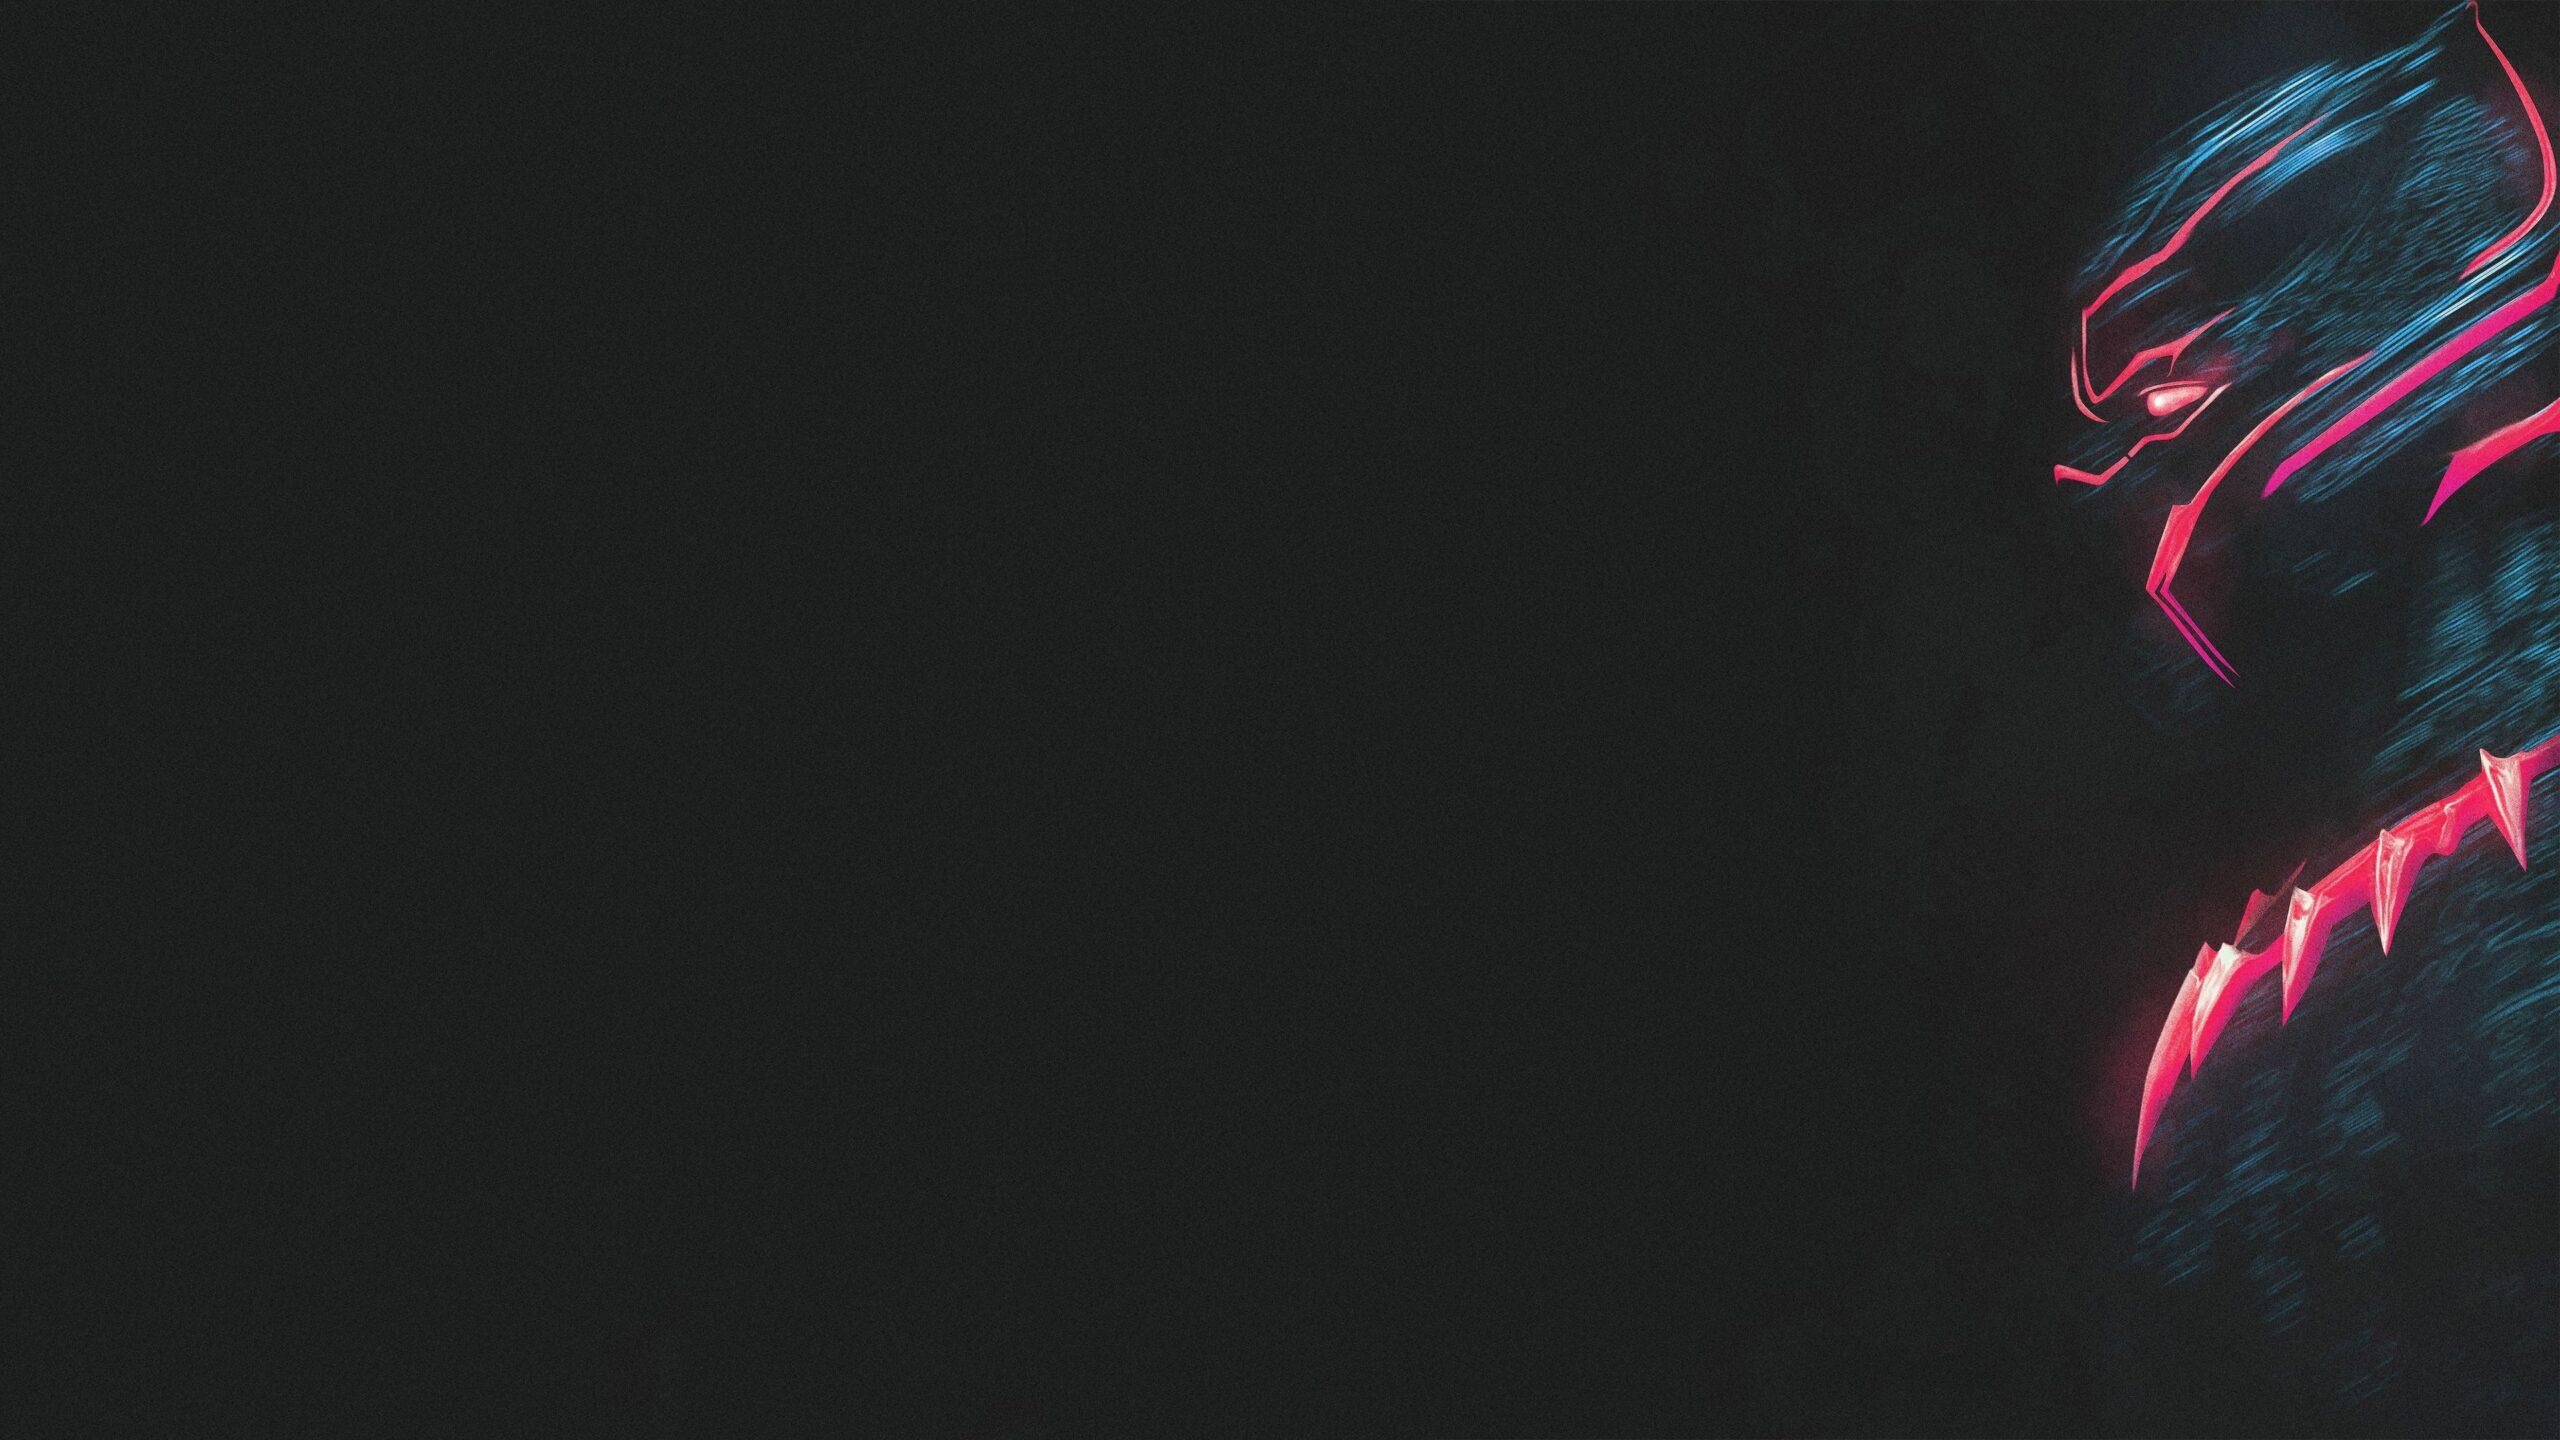 Fondos de pantalla gamer 4k